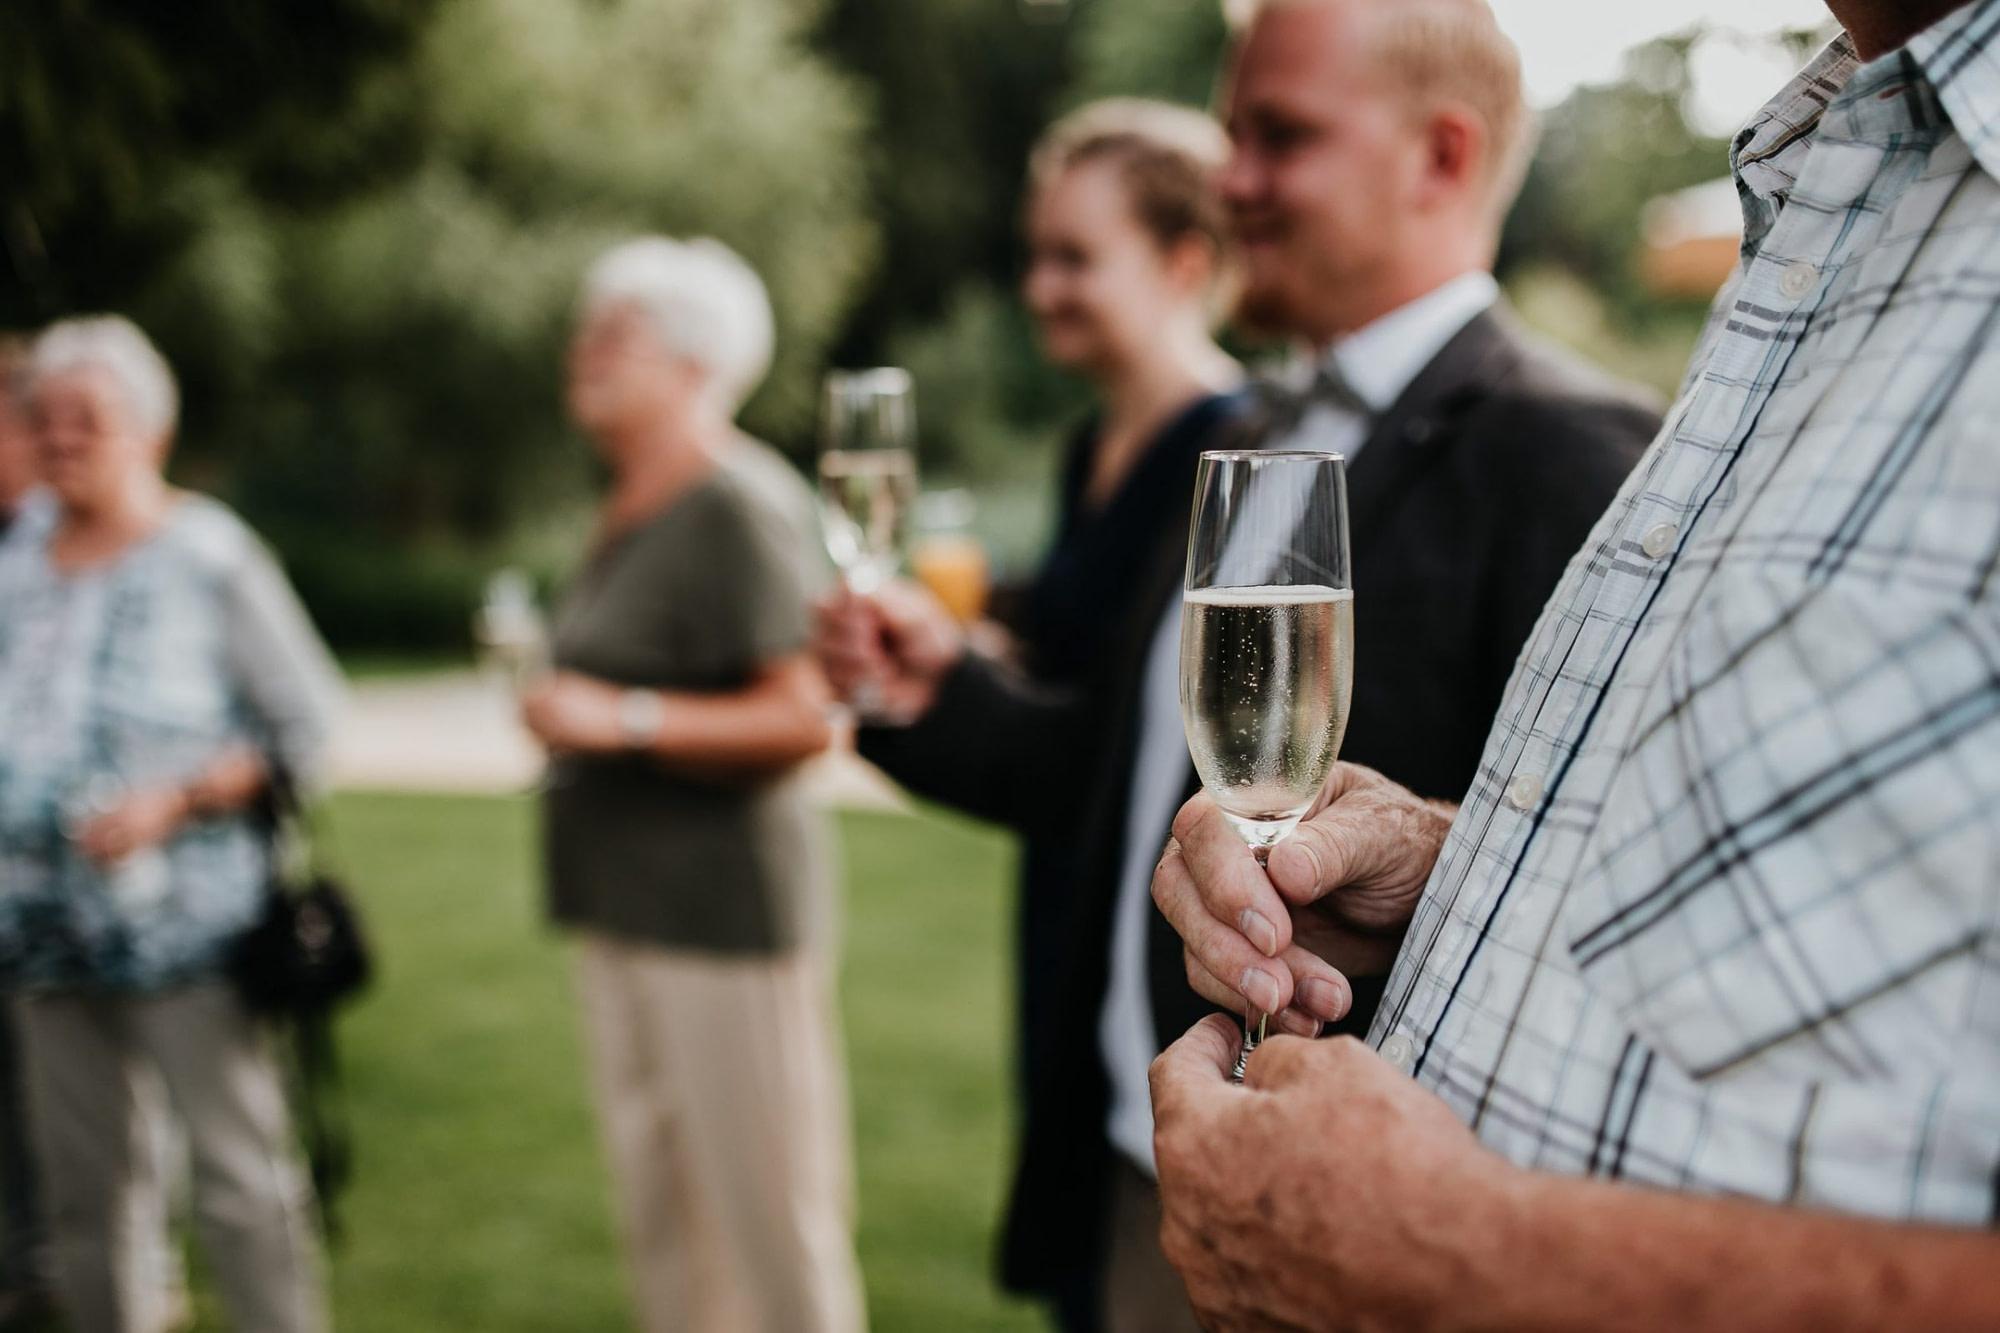 wedding guests, laughter, laughing, table decor, garden wedding, garden tent, hochzeitsgäste, zelt, brautvater, rede, speech, sekt, sektempfang, champagne, toast